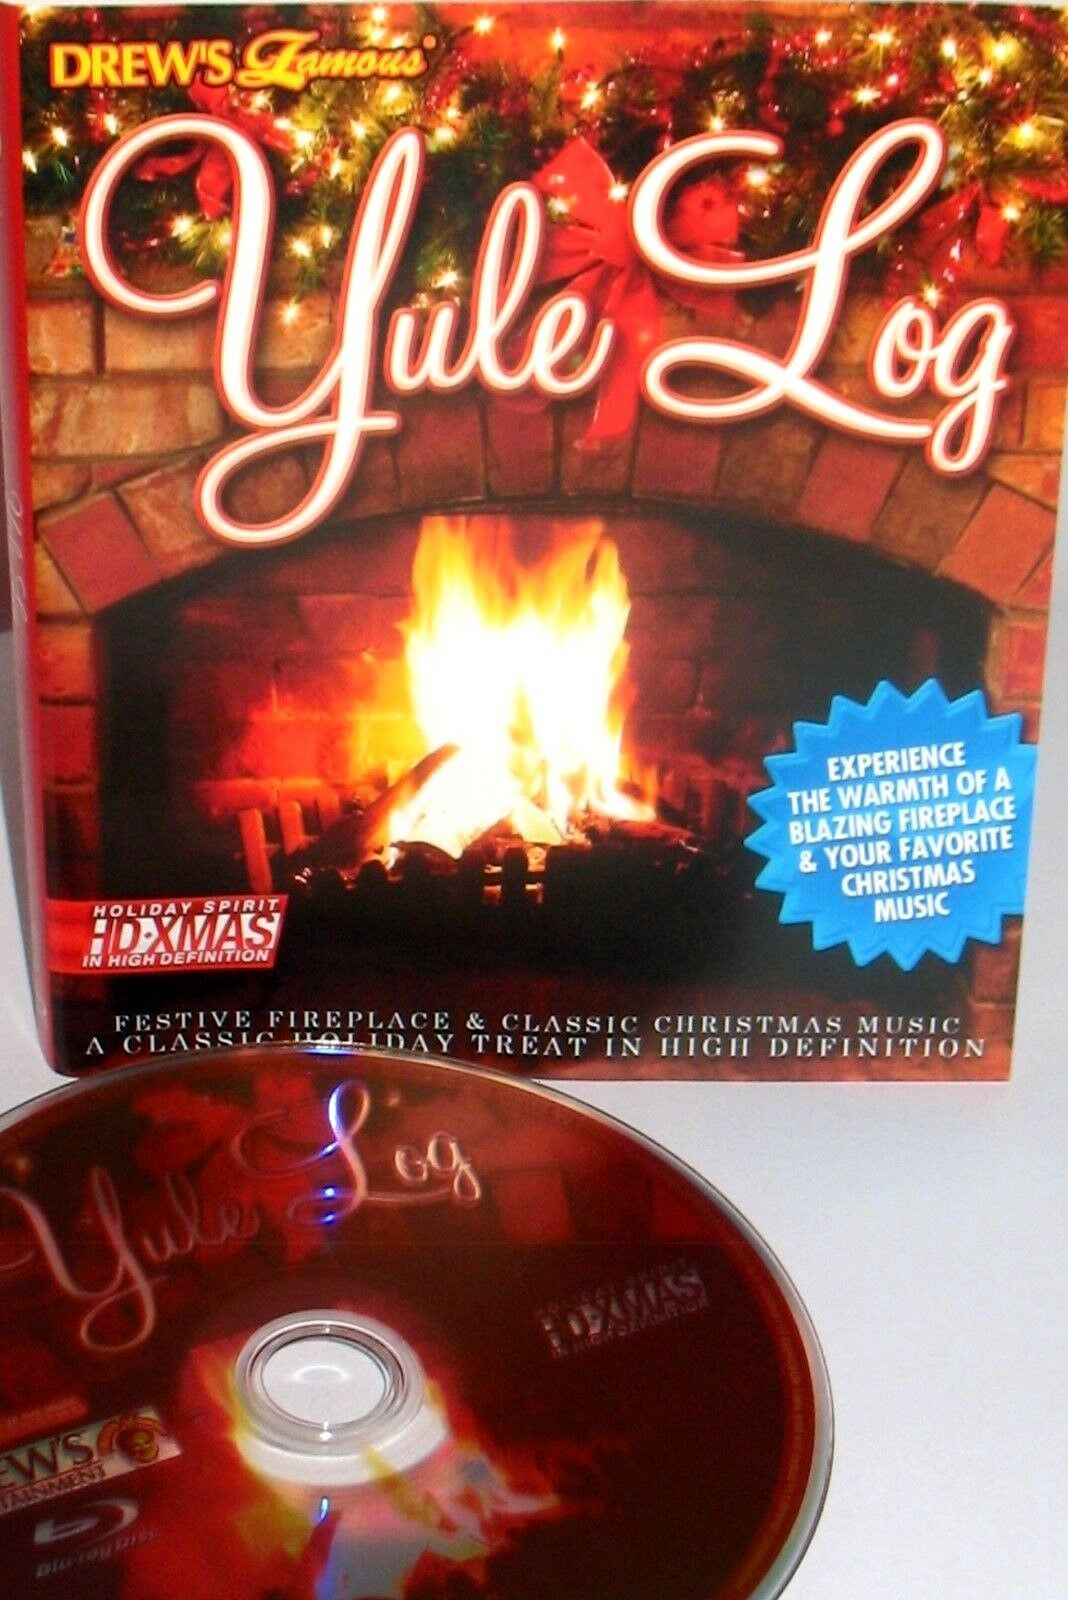 Drew's Famous Yule Log Christmas Fireplace Blu-Ray Disc